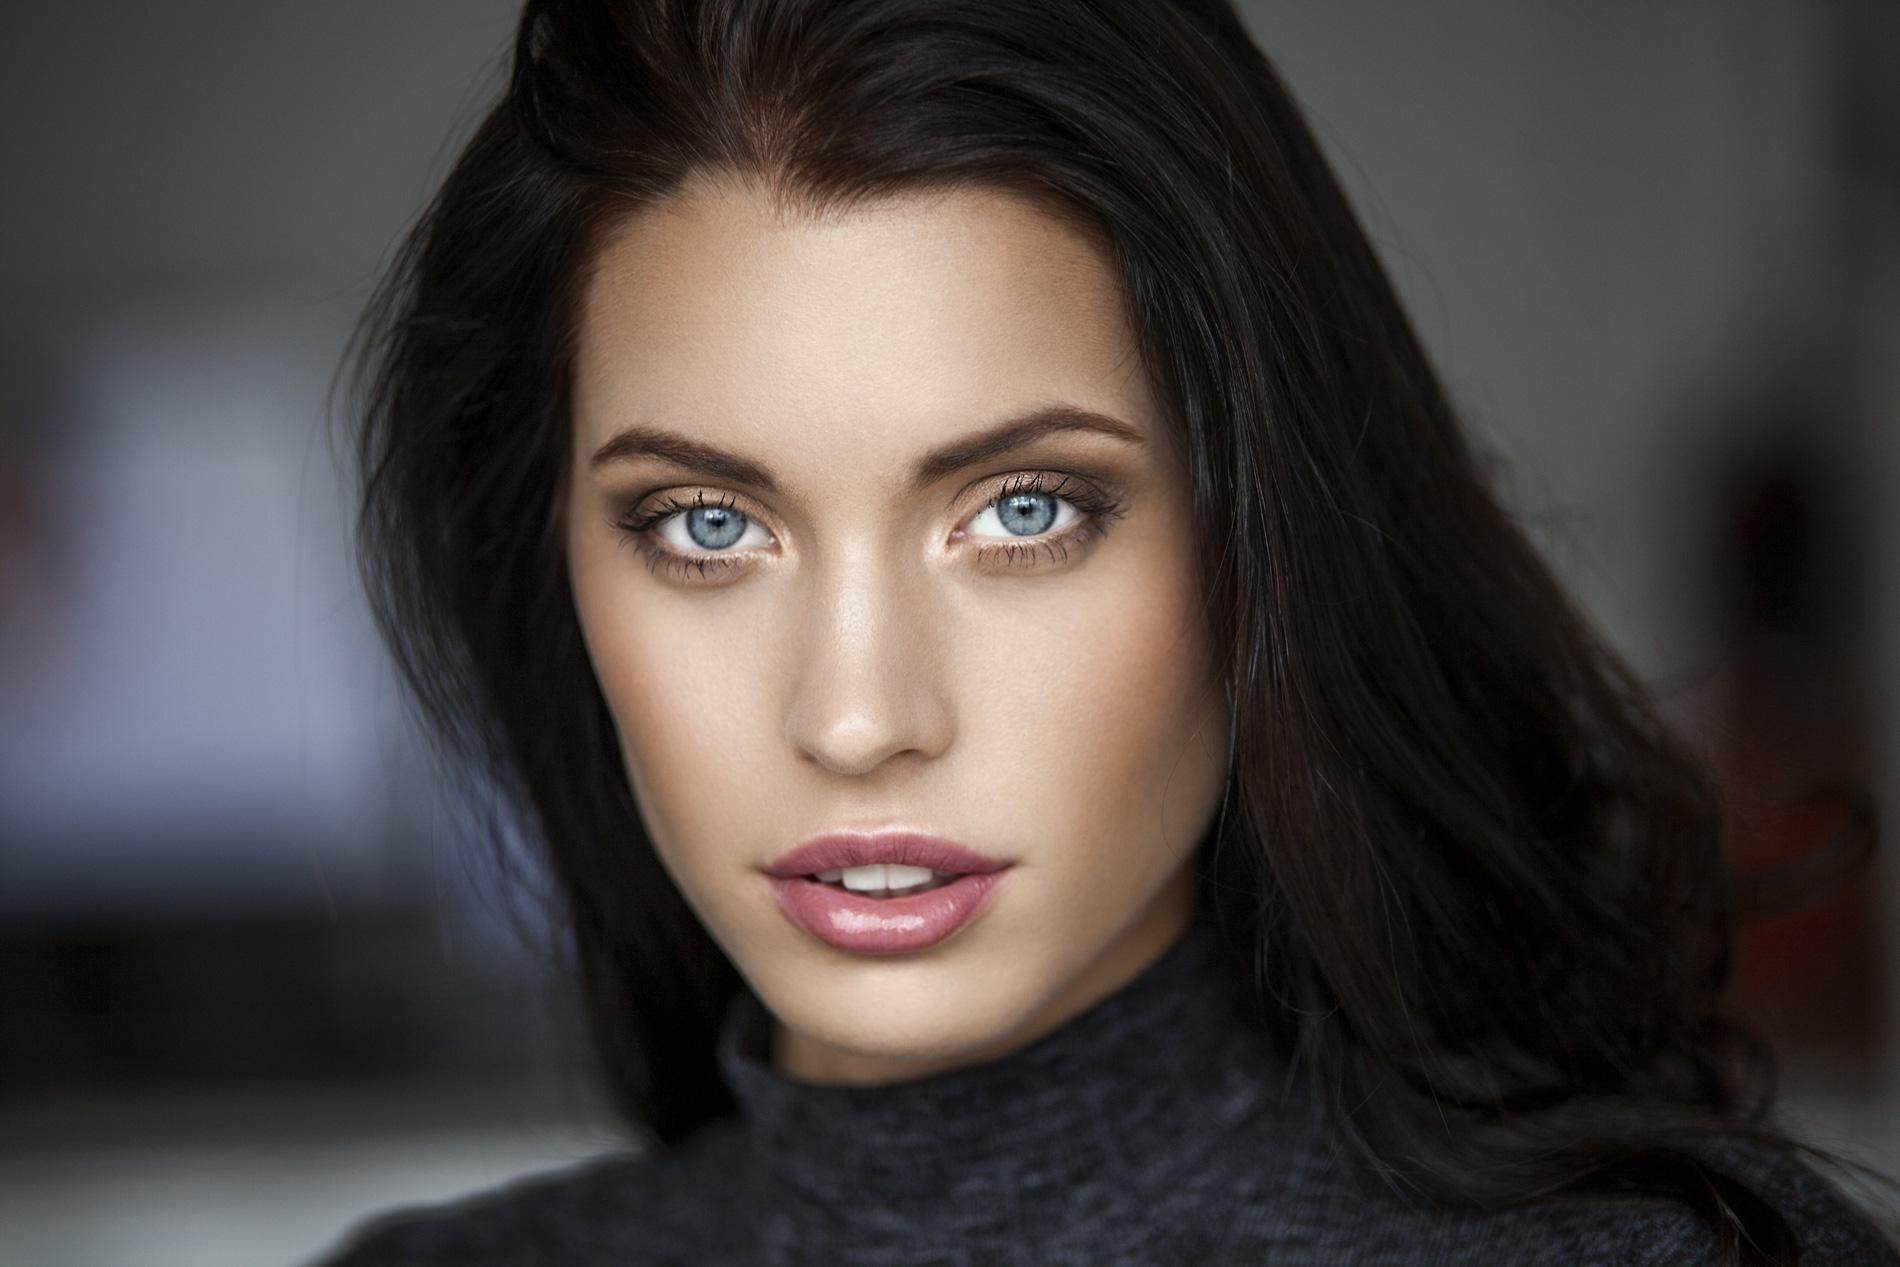 Sarah-Anessa Hitzschke GNTM